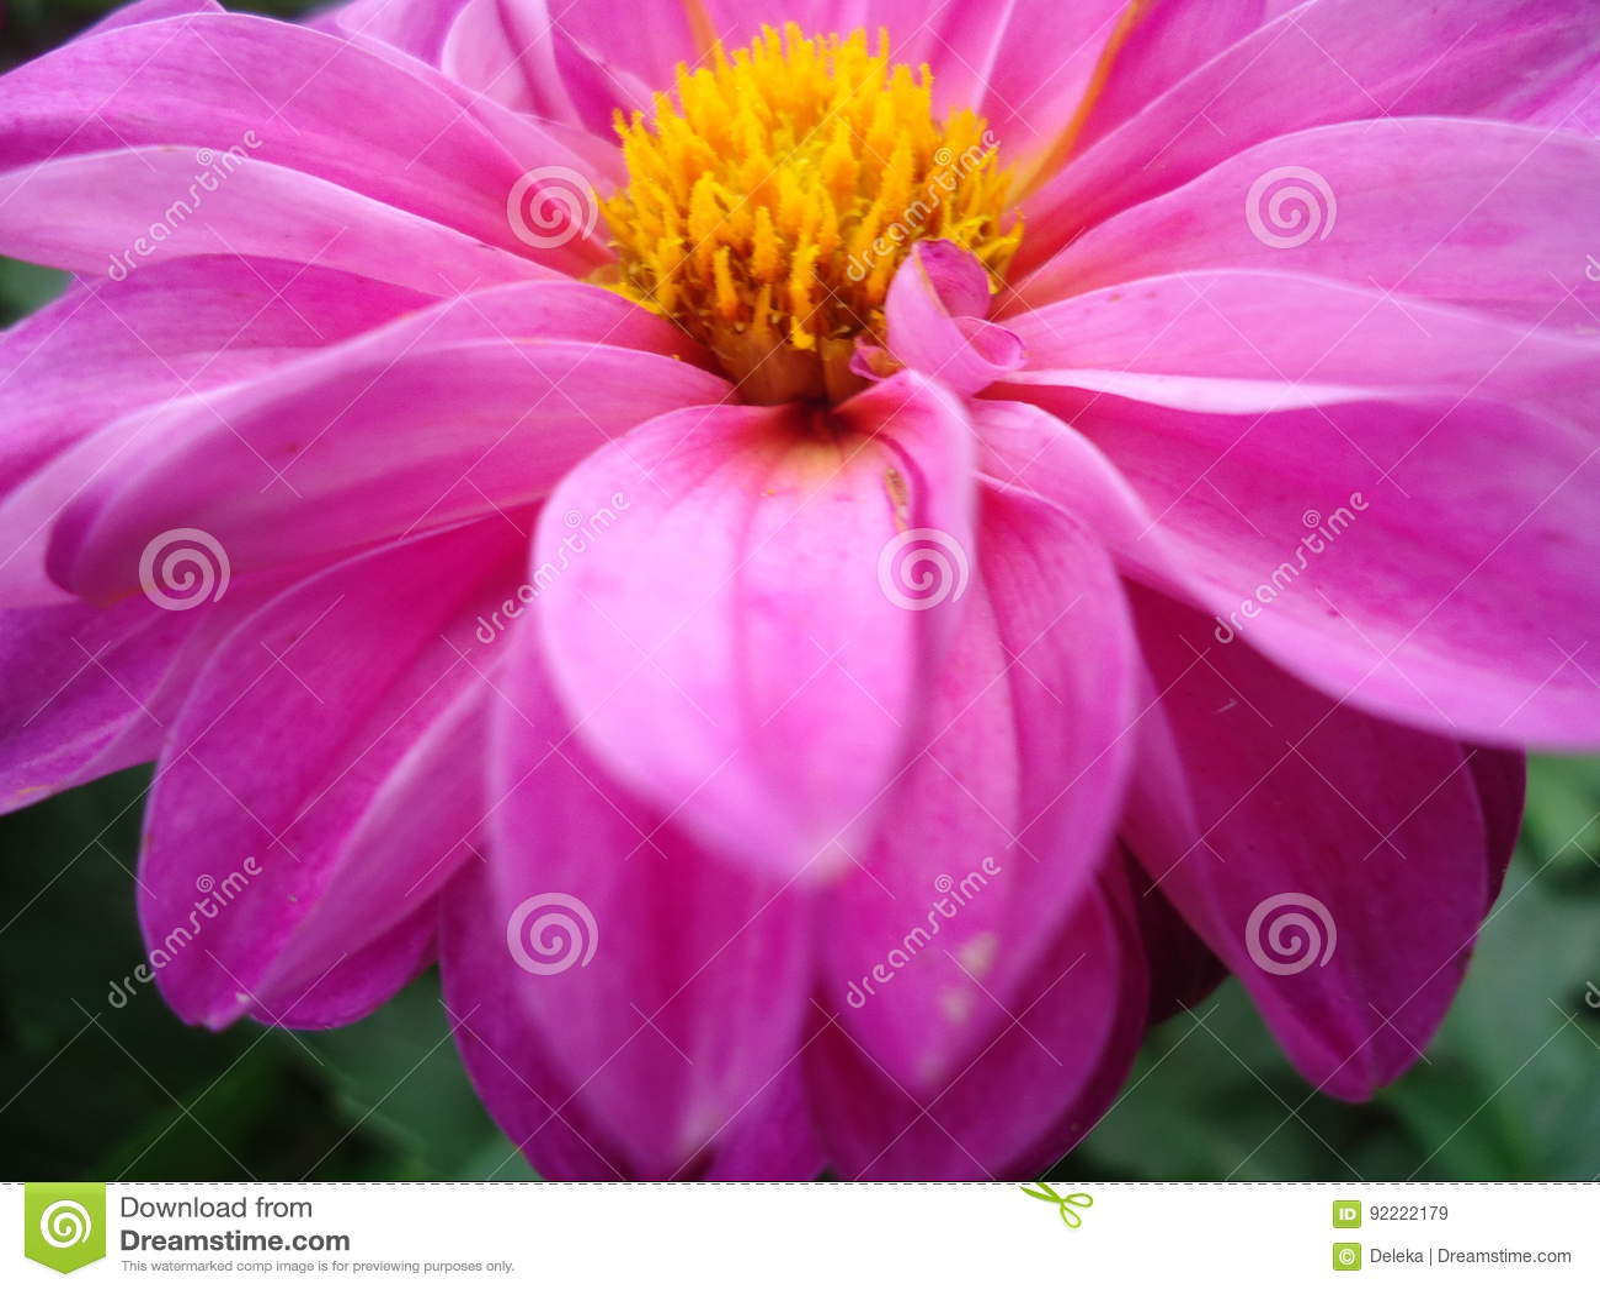 Dahlia flower stock image image of flowers dahlia 92222179 flowers dahlia aster family are one of the most beautiful and flowering garden flowers izmirmasajfo